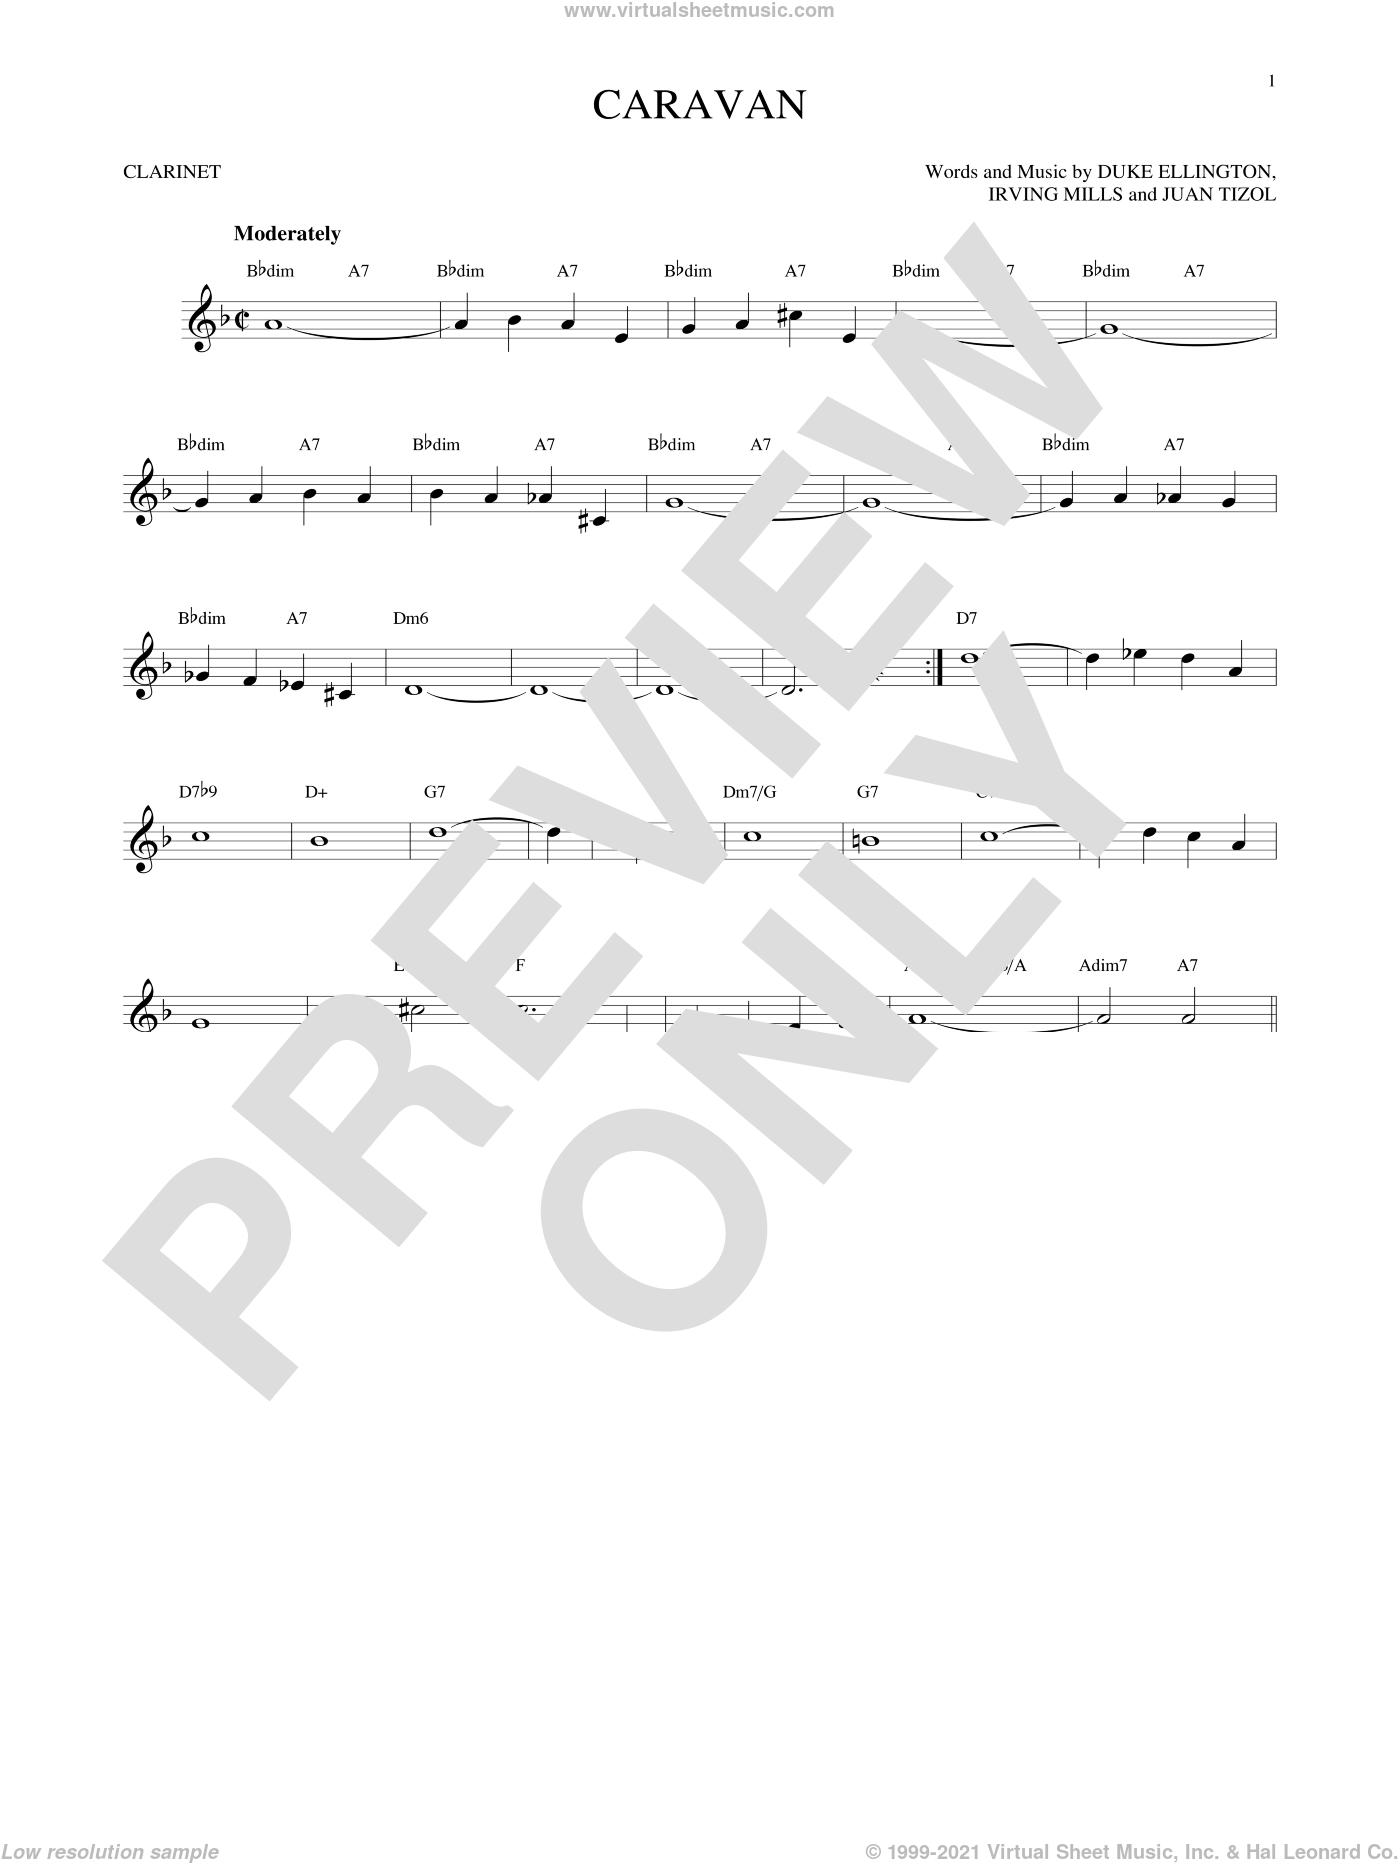 Caravan sheet music for clarinet solo by Duke Ellington, Billy Eckstine, Duke Ellington and his Orchestra, Ralph Marterie, Irving Mills, Juan Tizol and Juan Tizol & Duke Ellington, intermediate skill level